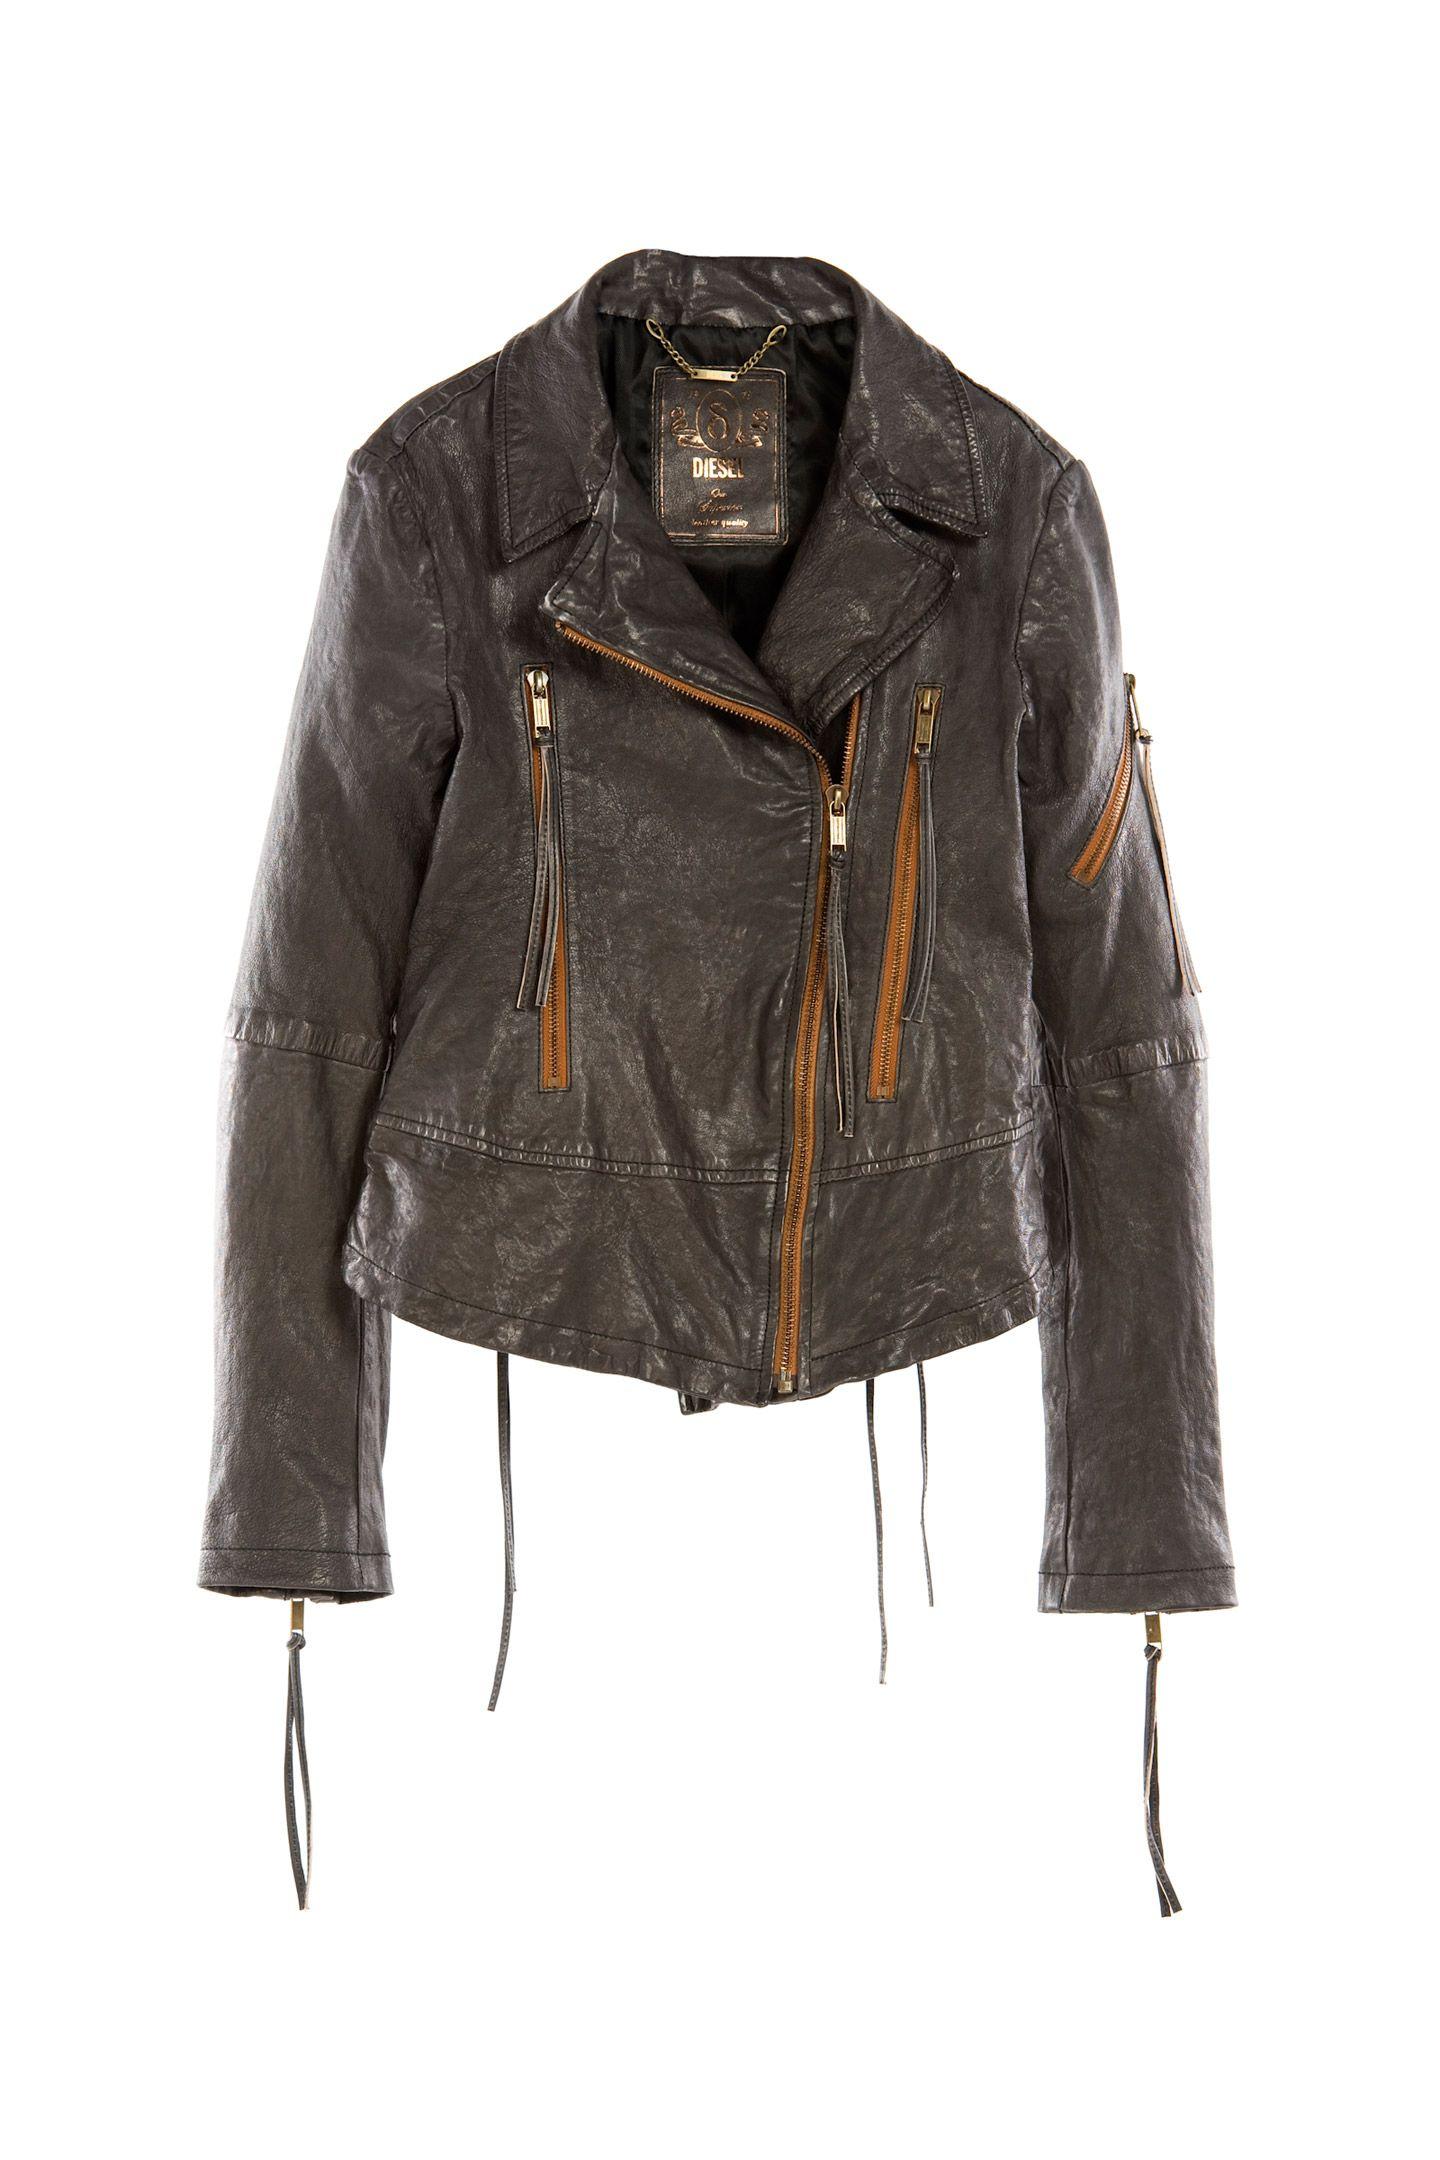 Diesel Collection L Nix Leather Jacket Elle Fashion Fashion [ 2160 x 1440 Pixel ]